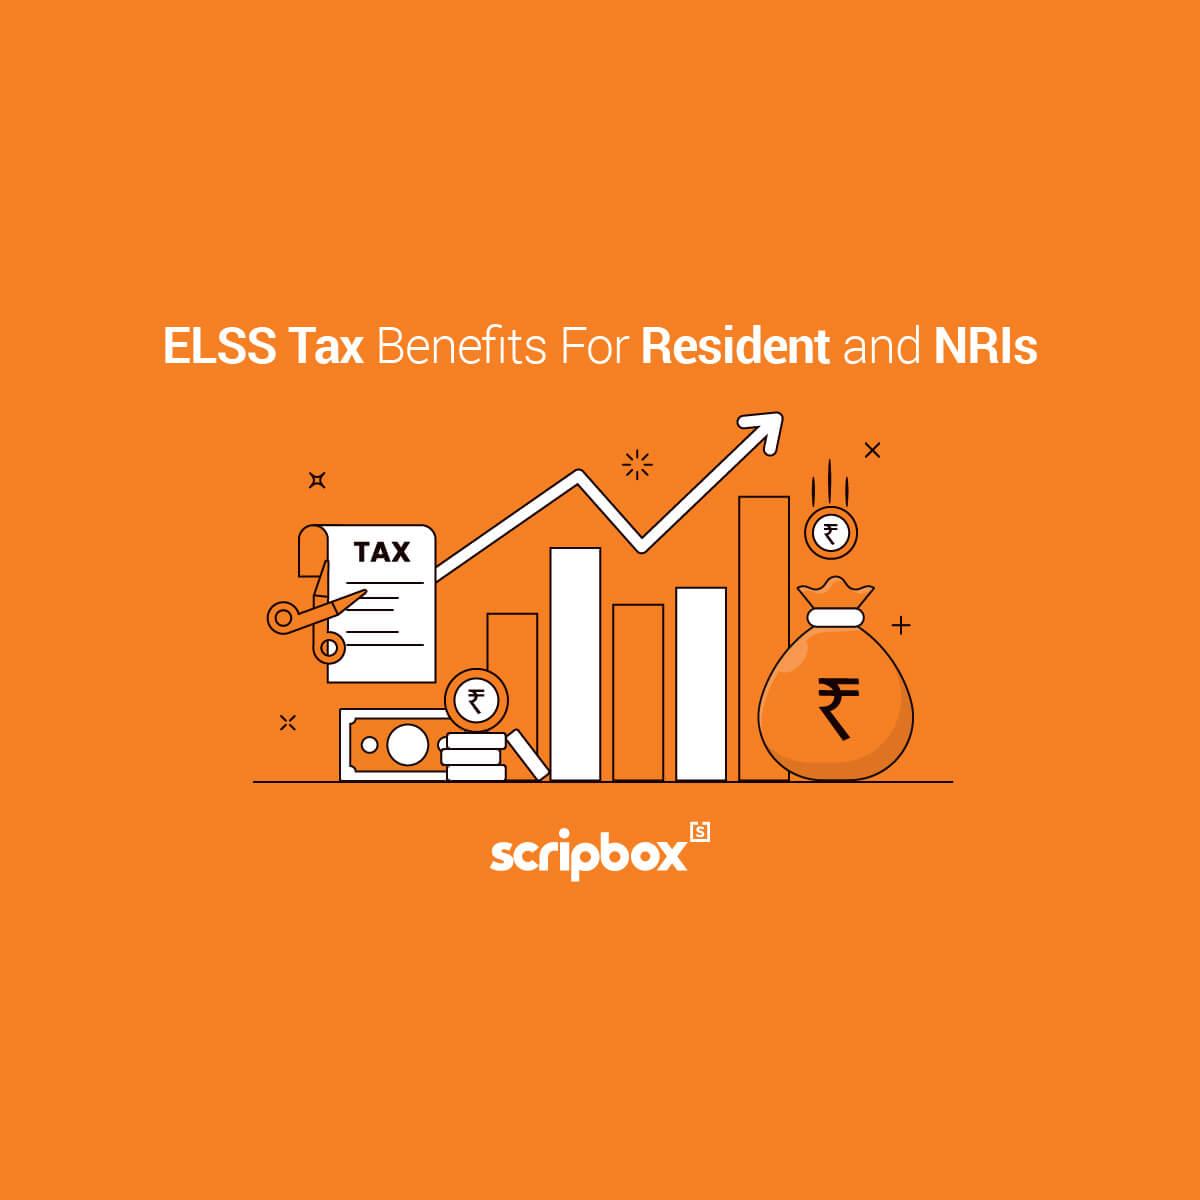 elss tax benefits